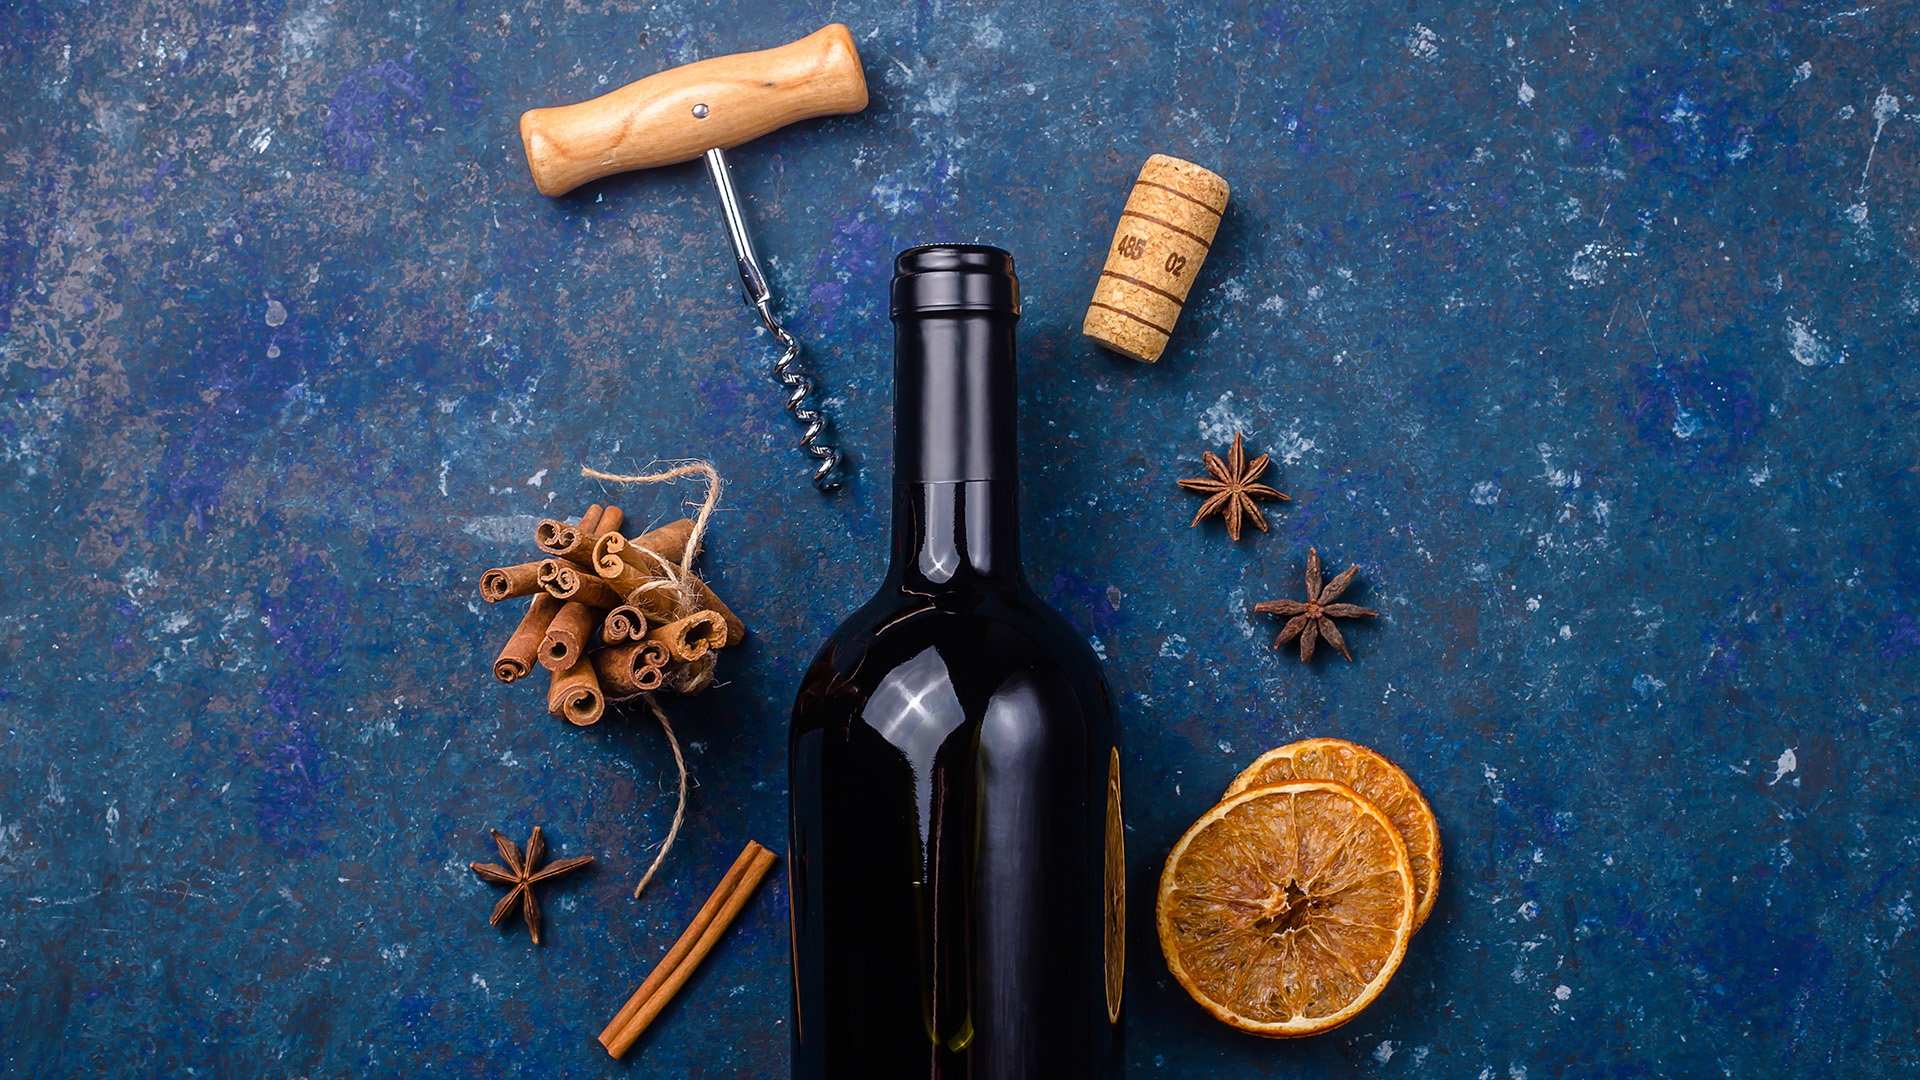 Üveg bor